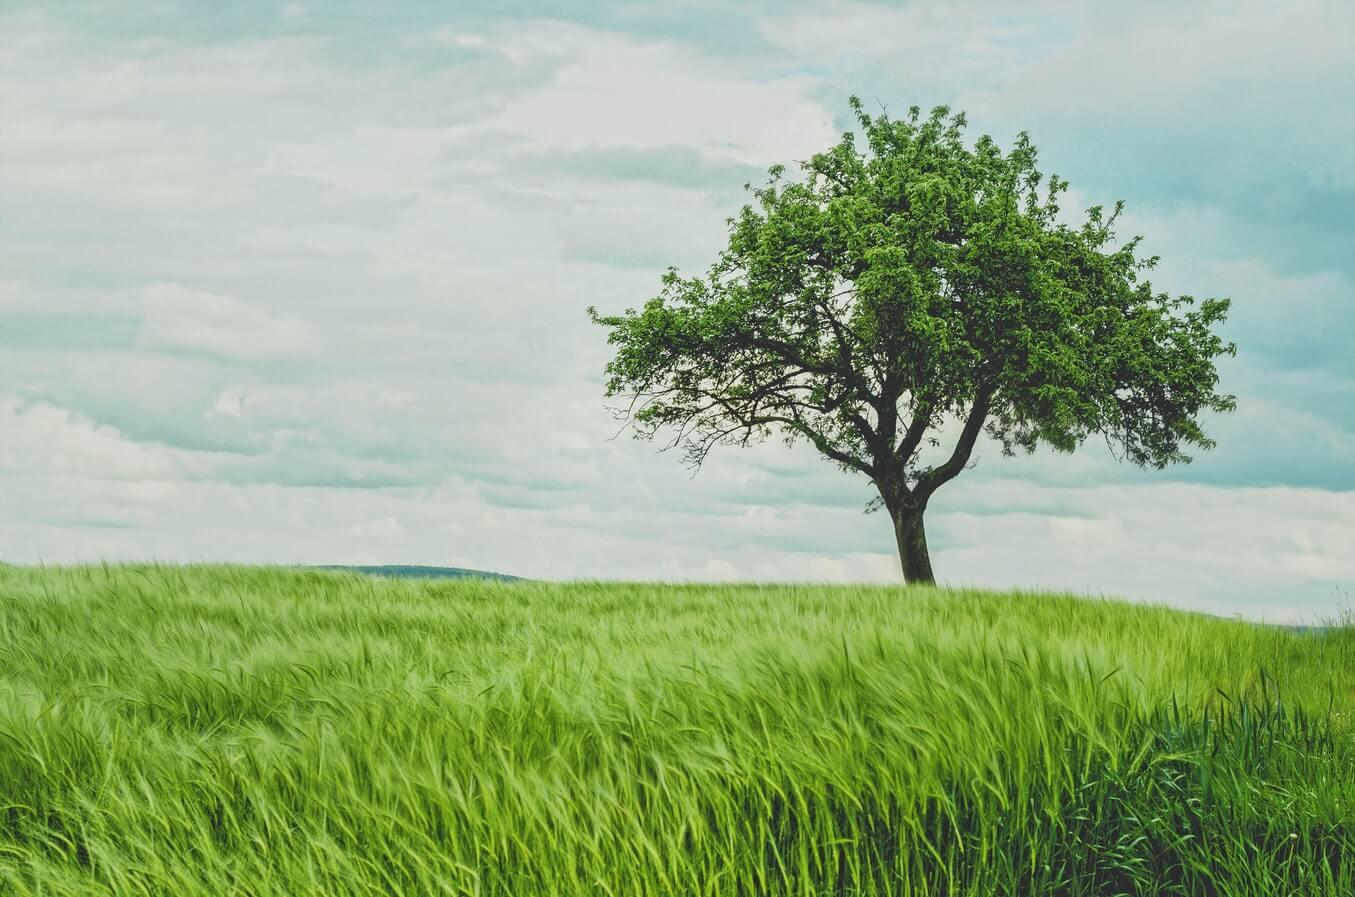 How to visualise RFM data using treemaps